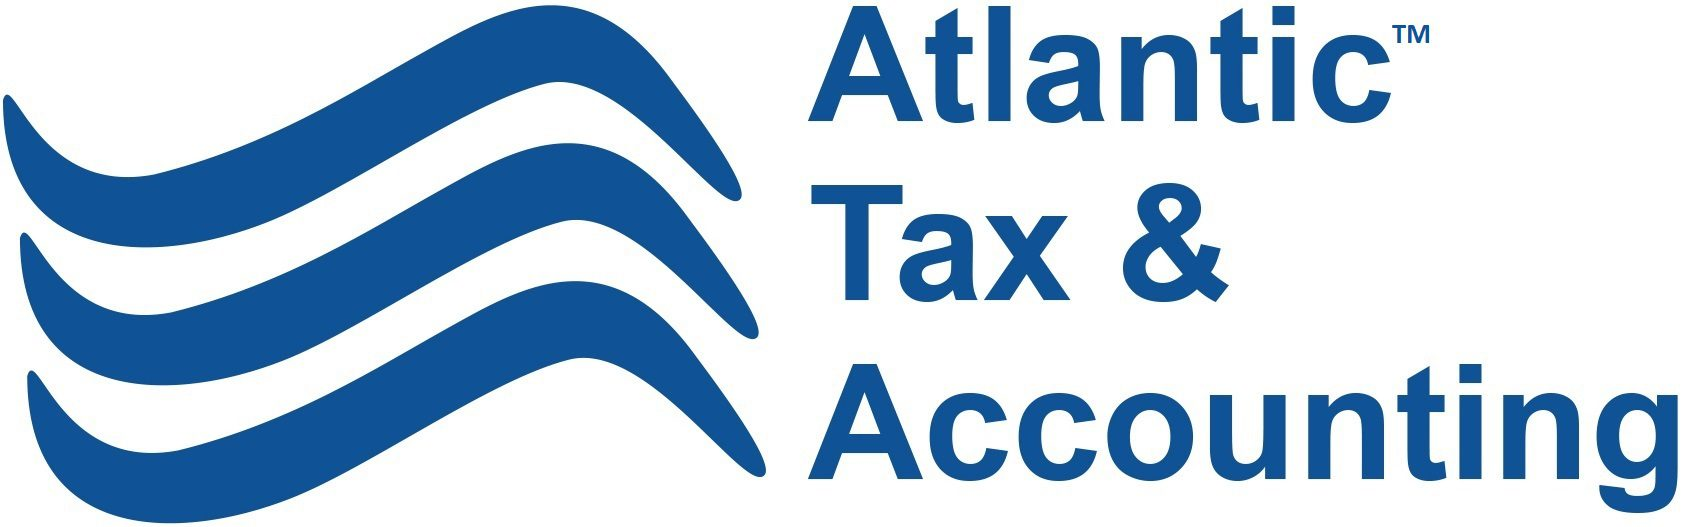 Atlantic Tax and Accounting Pompano Beach Florida